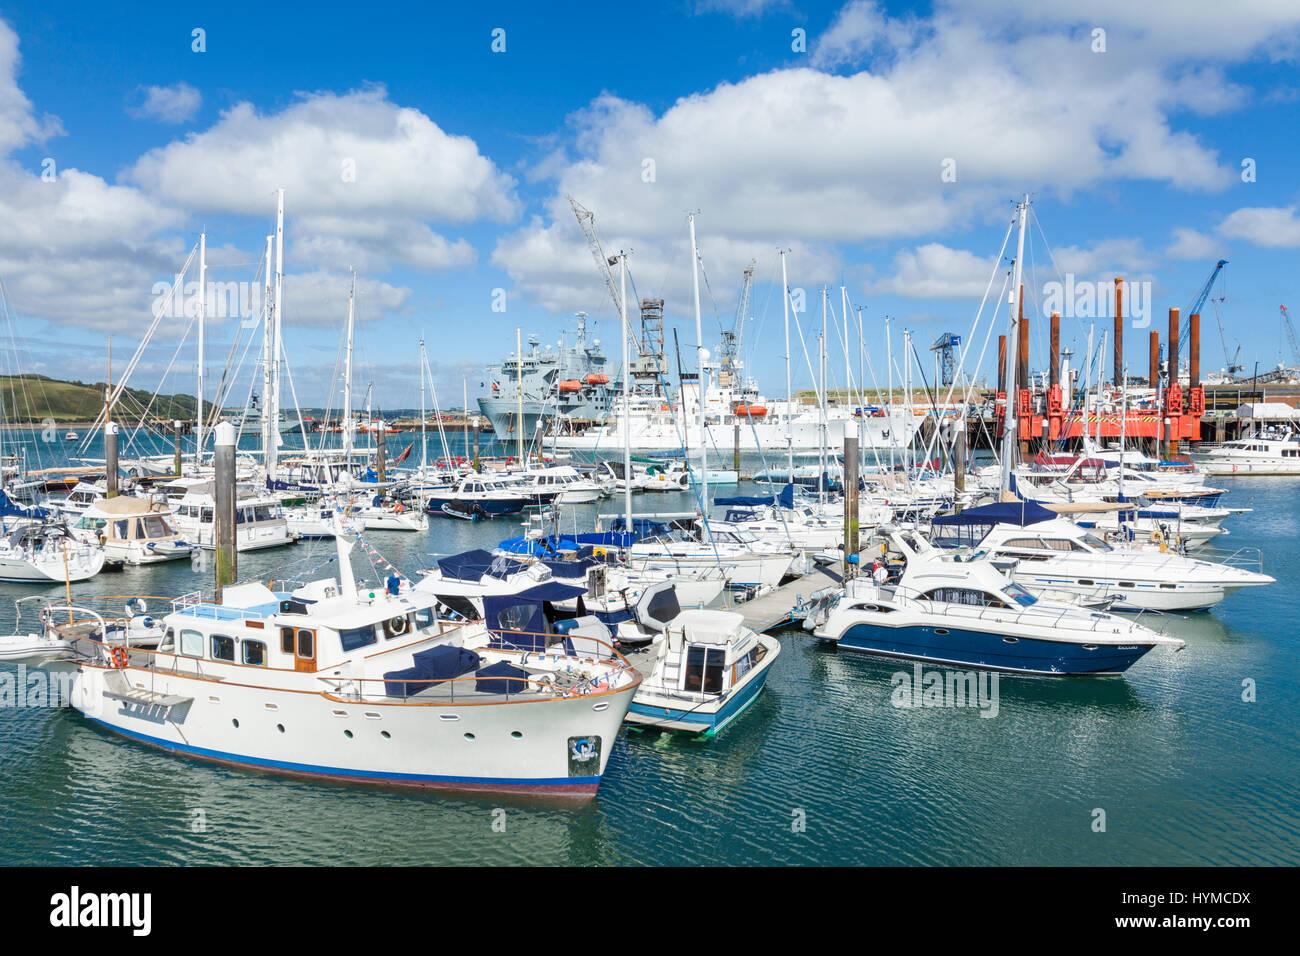 Falmouth cornwall Yachts and small boats in Port Pendennis Marina at  Falmouth Cornwall England West Country UK Stock Photo